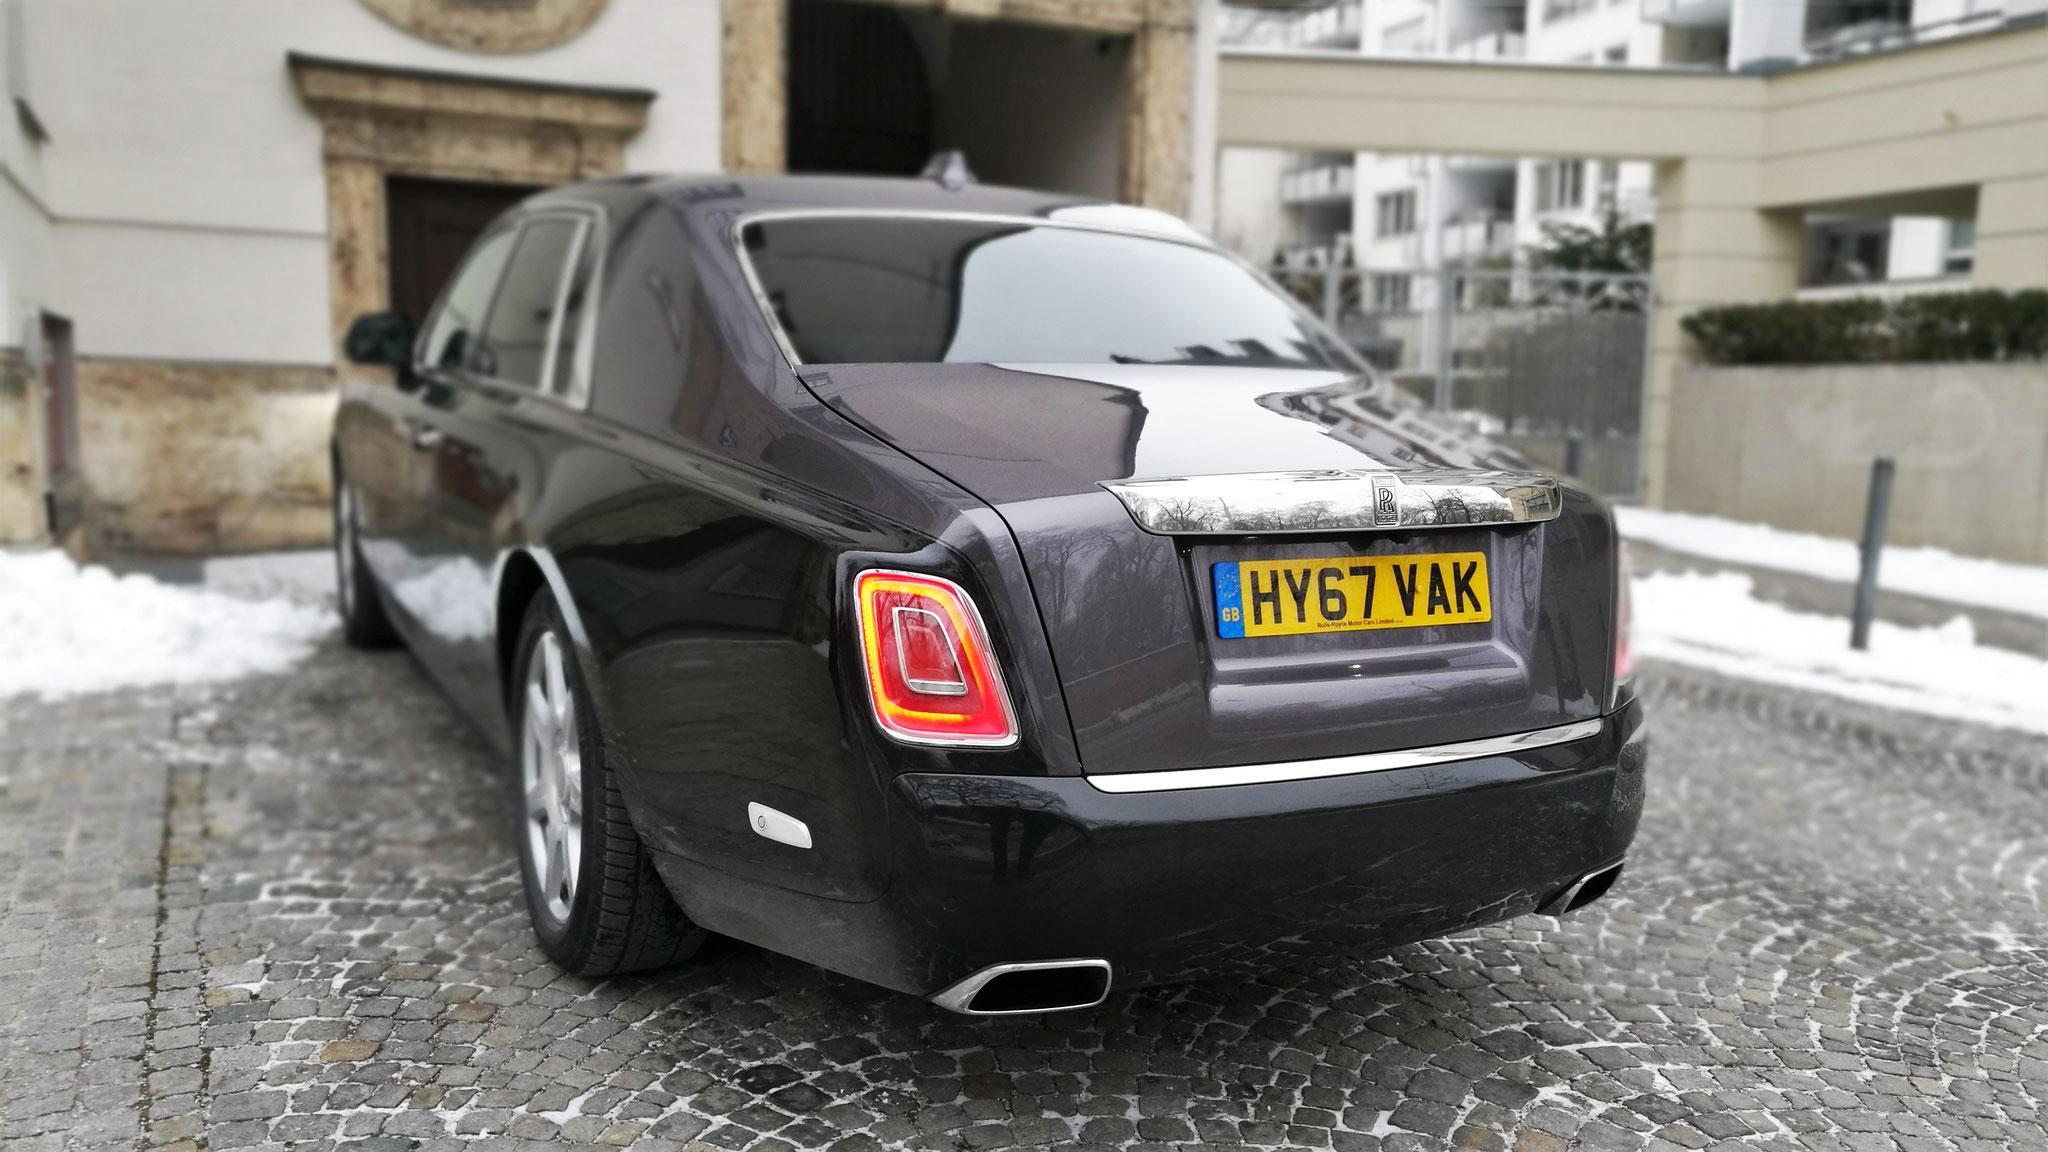 Rolls Royce Phantom - HY67-VAK (GB)